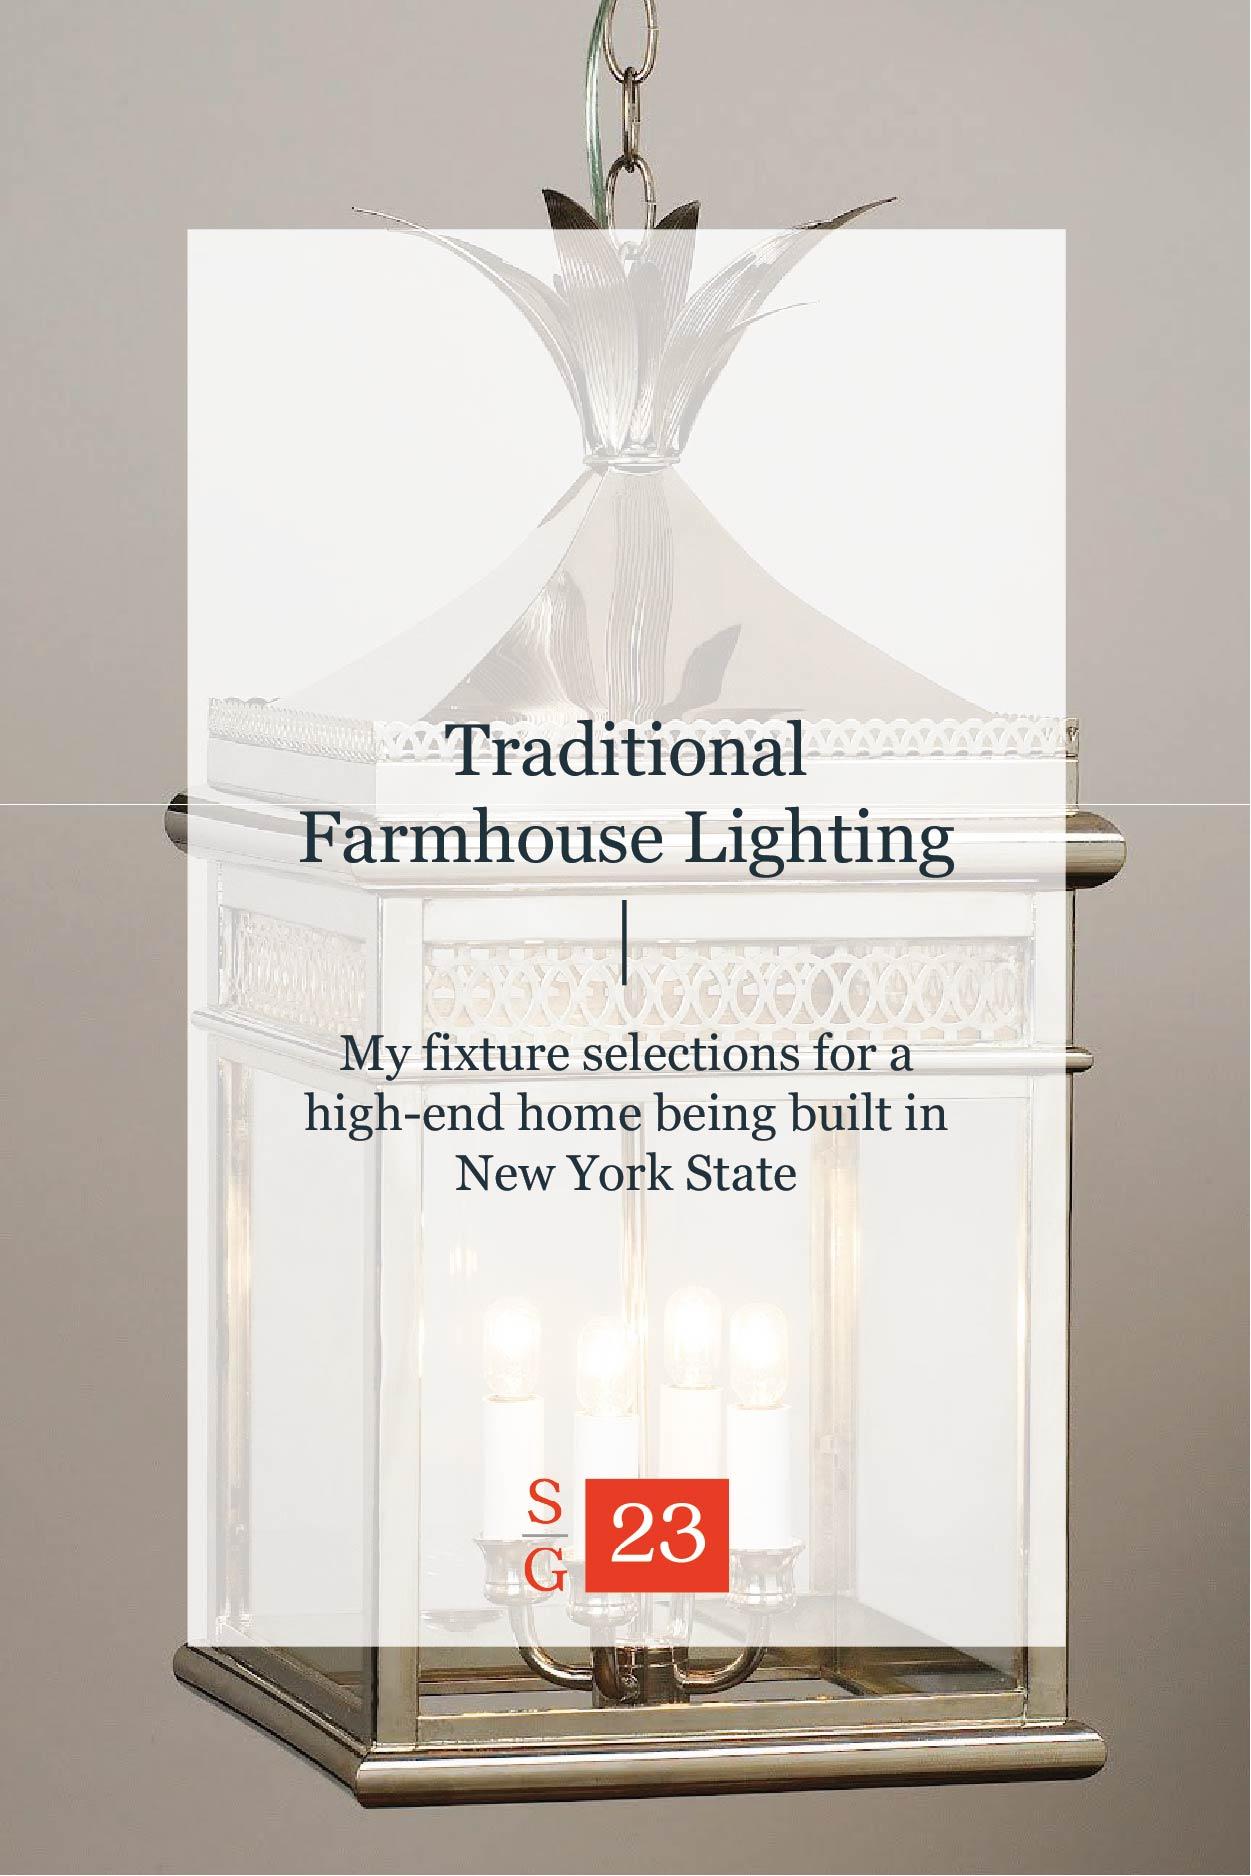 traditional-farmhouse-lighting-01.jpg